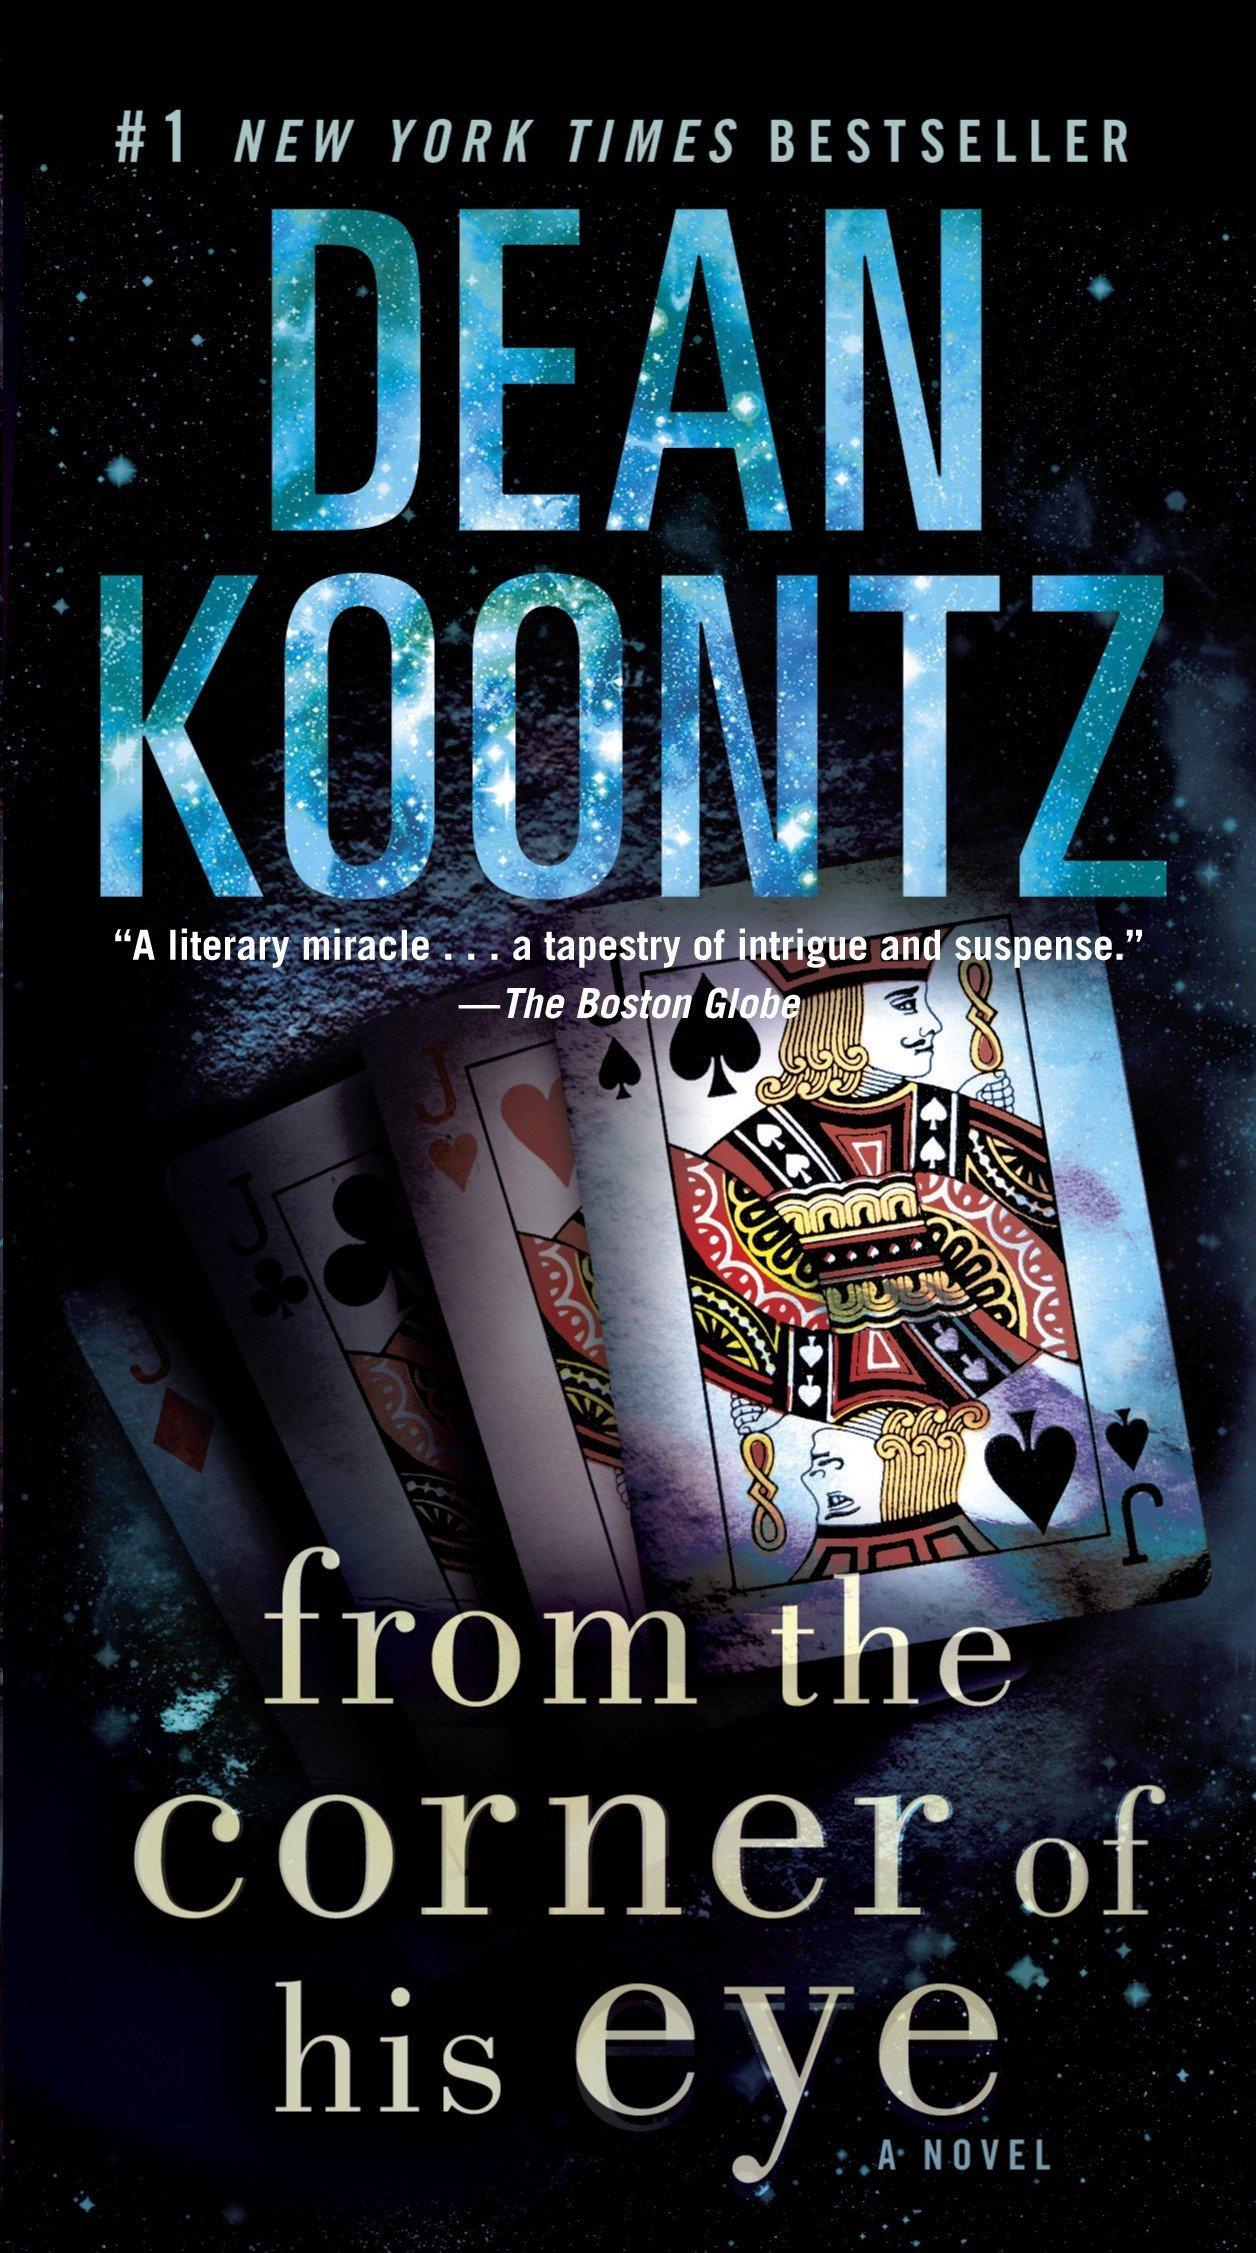 Amazon.com: From the Corner of His Eye: A Novel (9780553593259): Dean Koontz:  Books